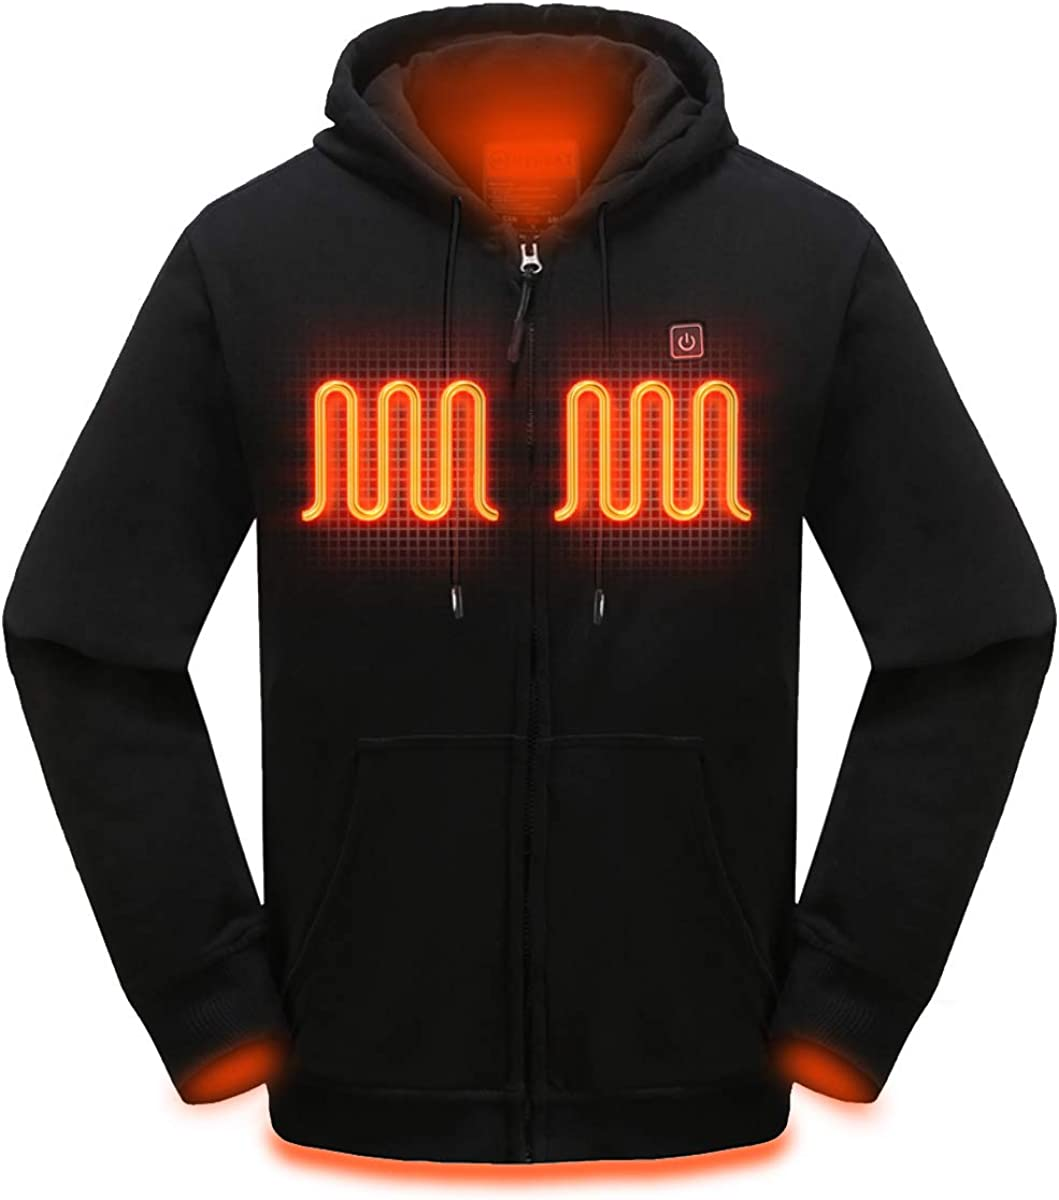 MYHEAT Heated Hoodie for Men Electric Sweater Heavyweight Fleece Sweatshirt with Battery